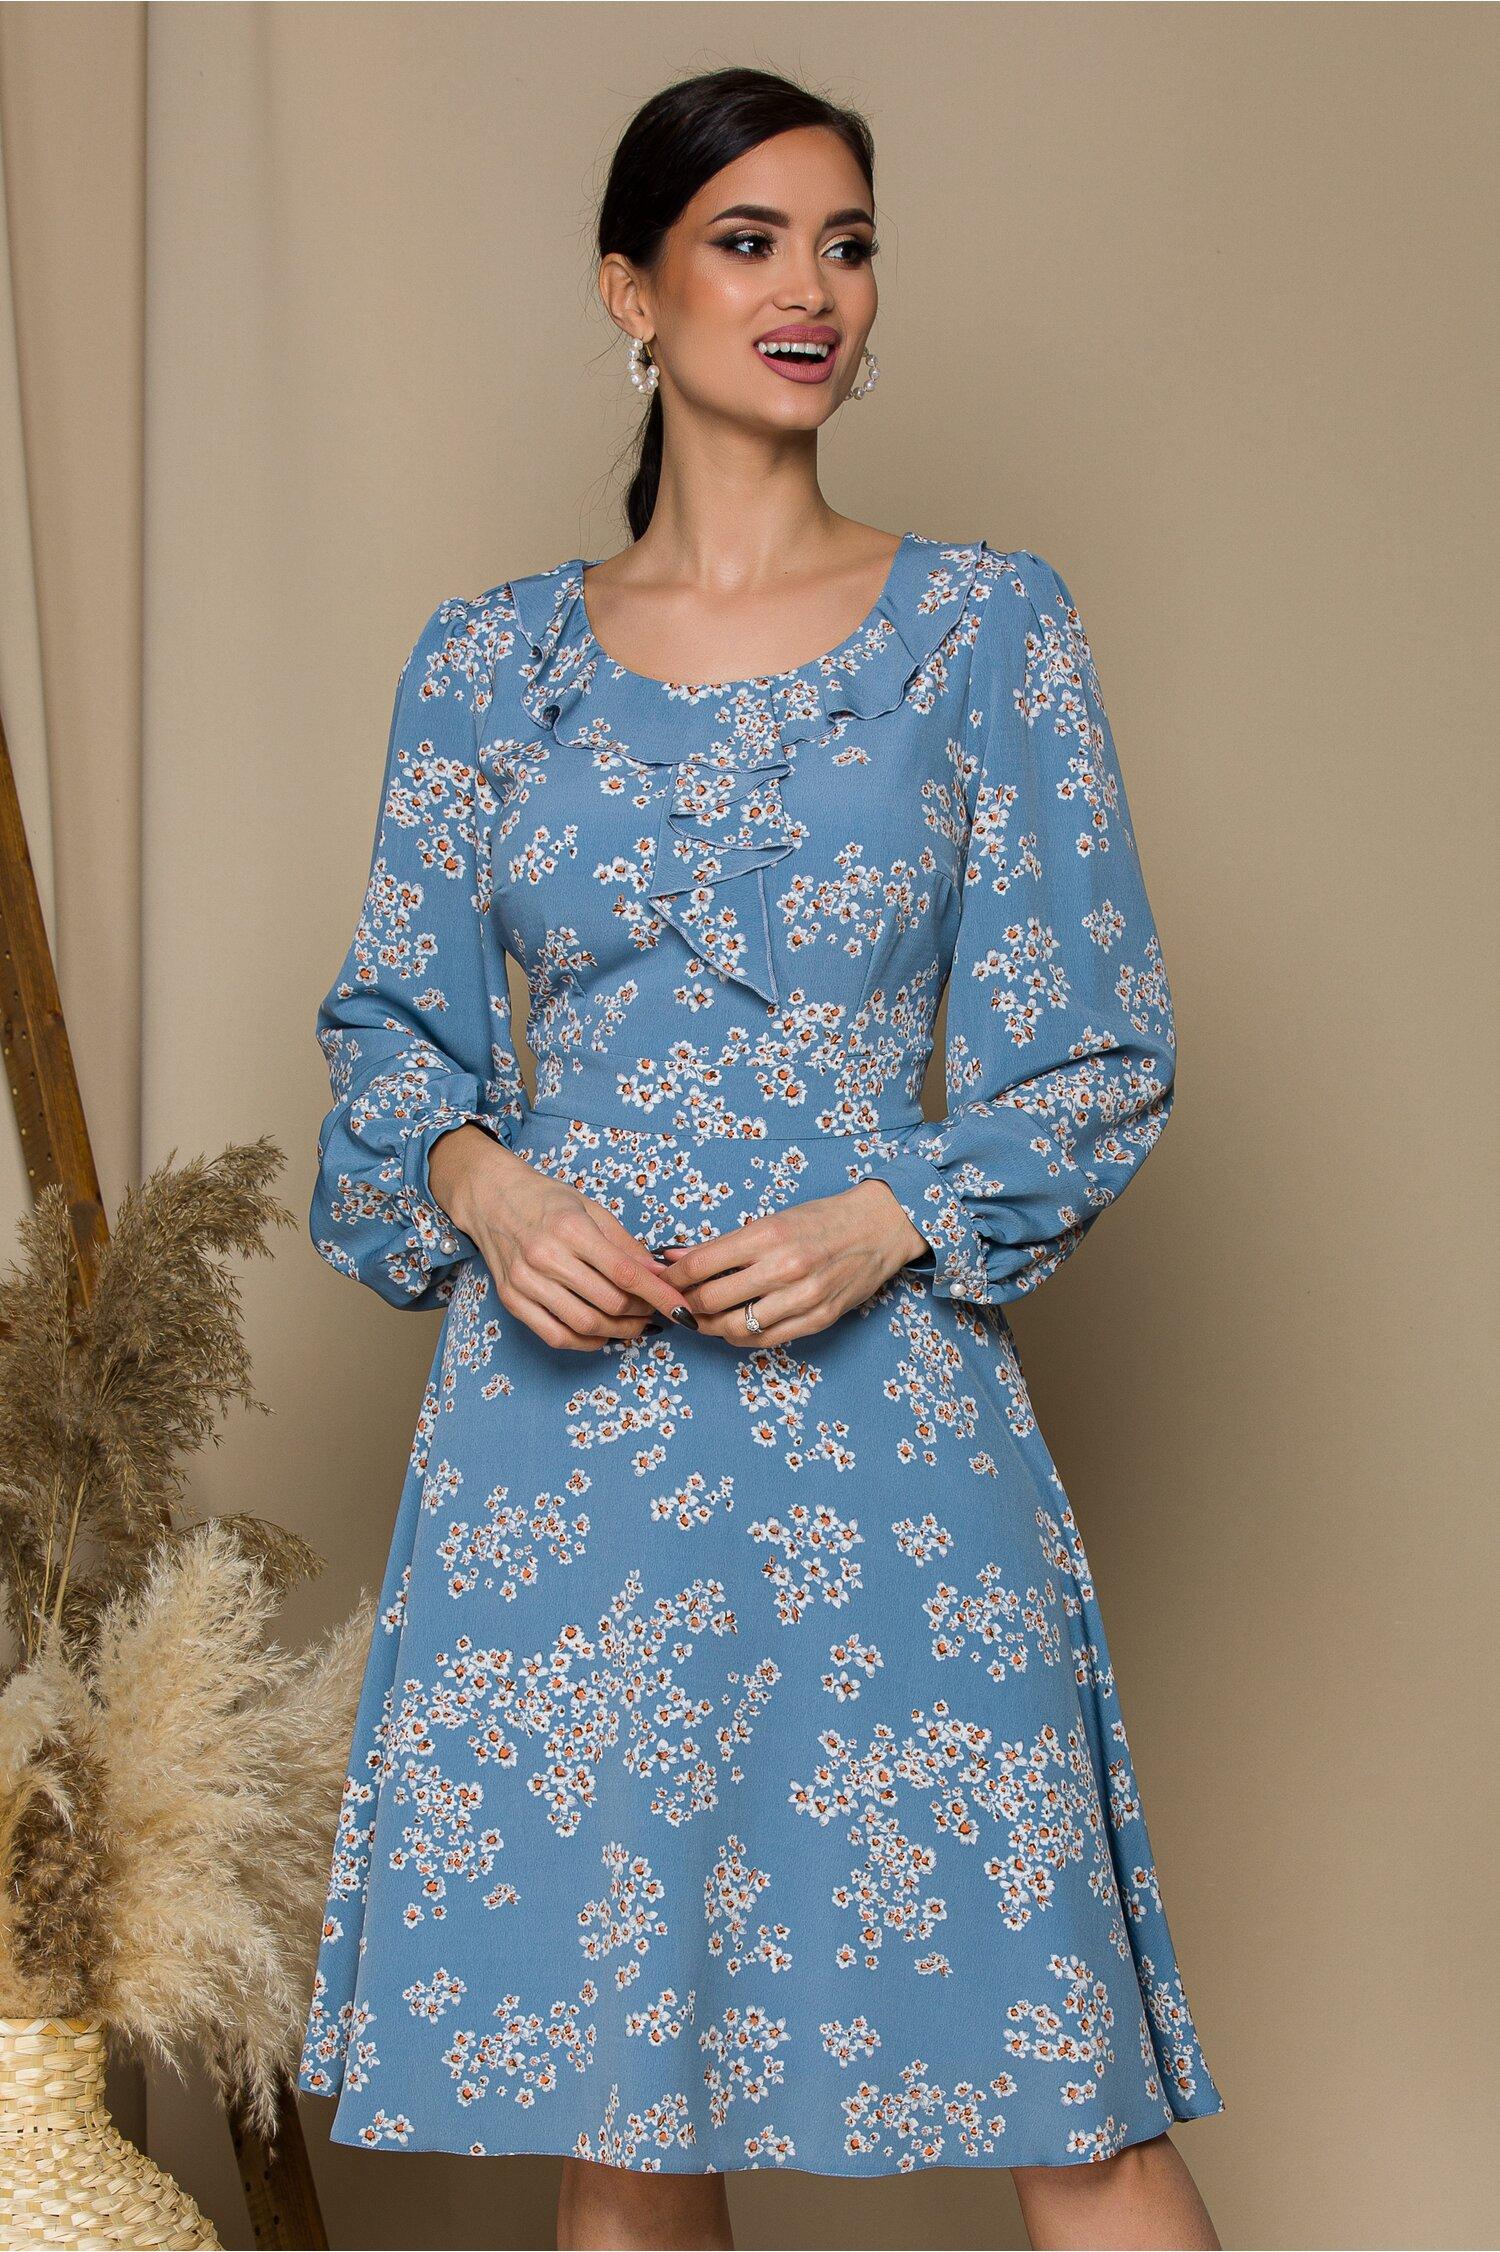 Rochie Mela bleu cu imprimeu floral in nuante de alb